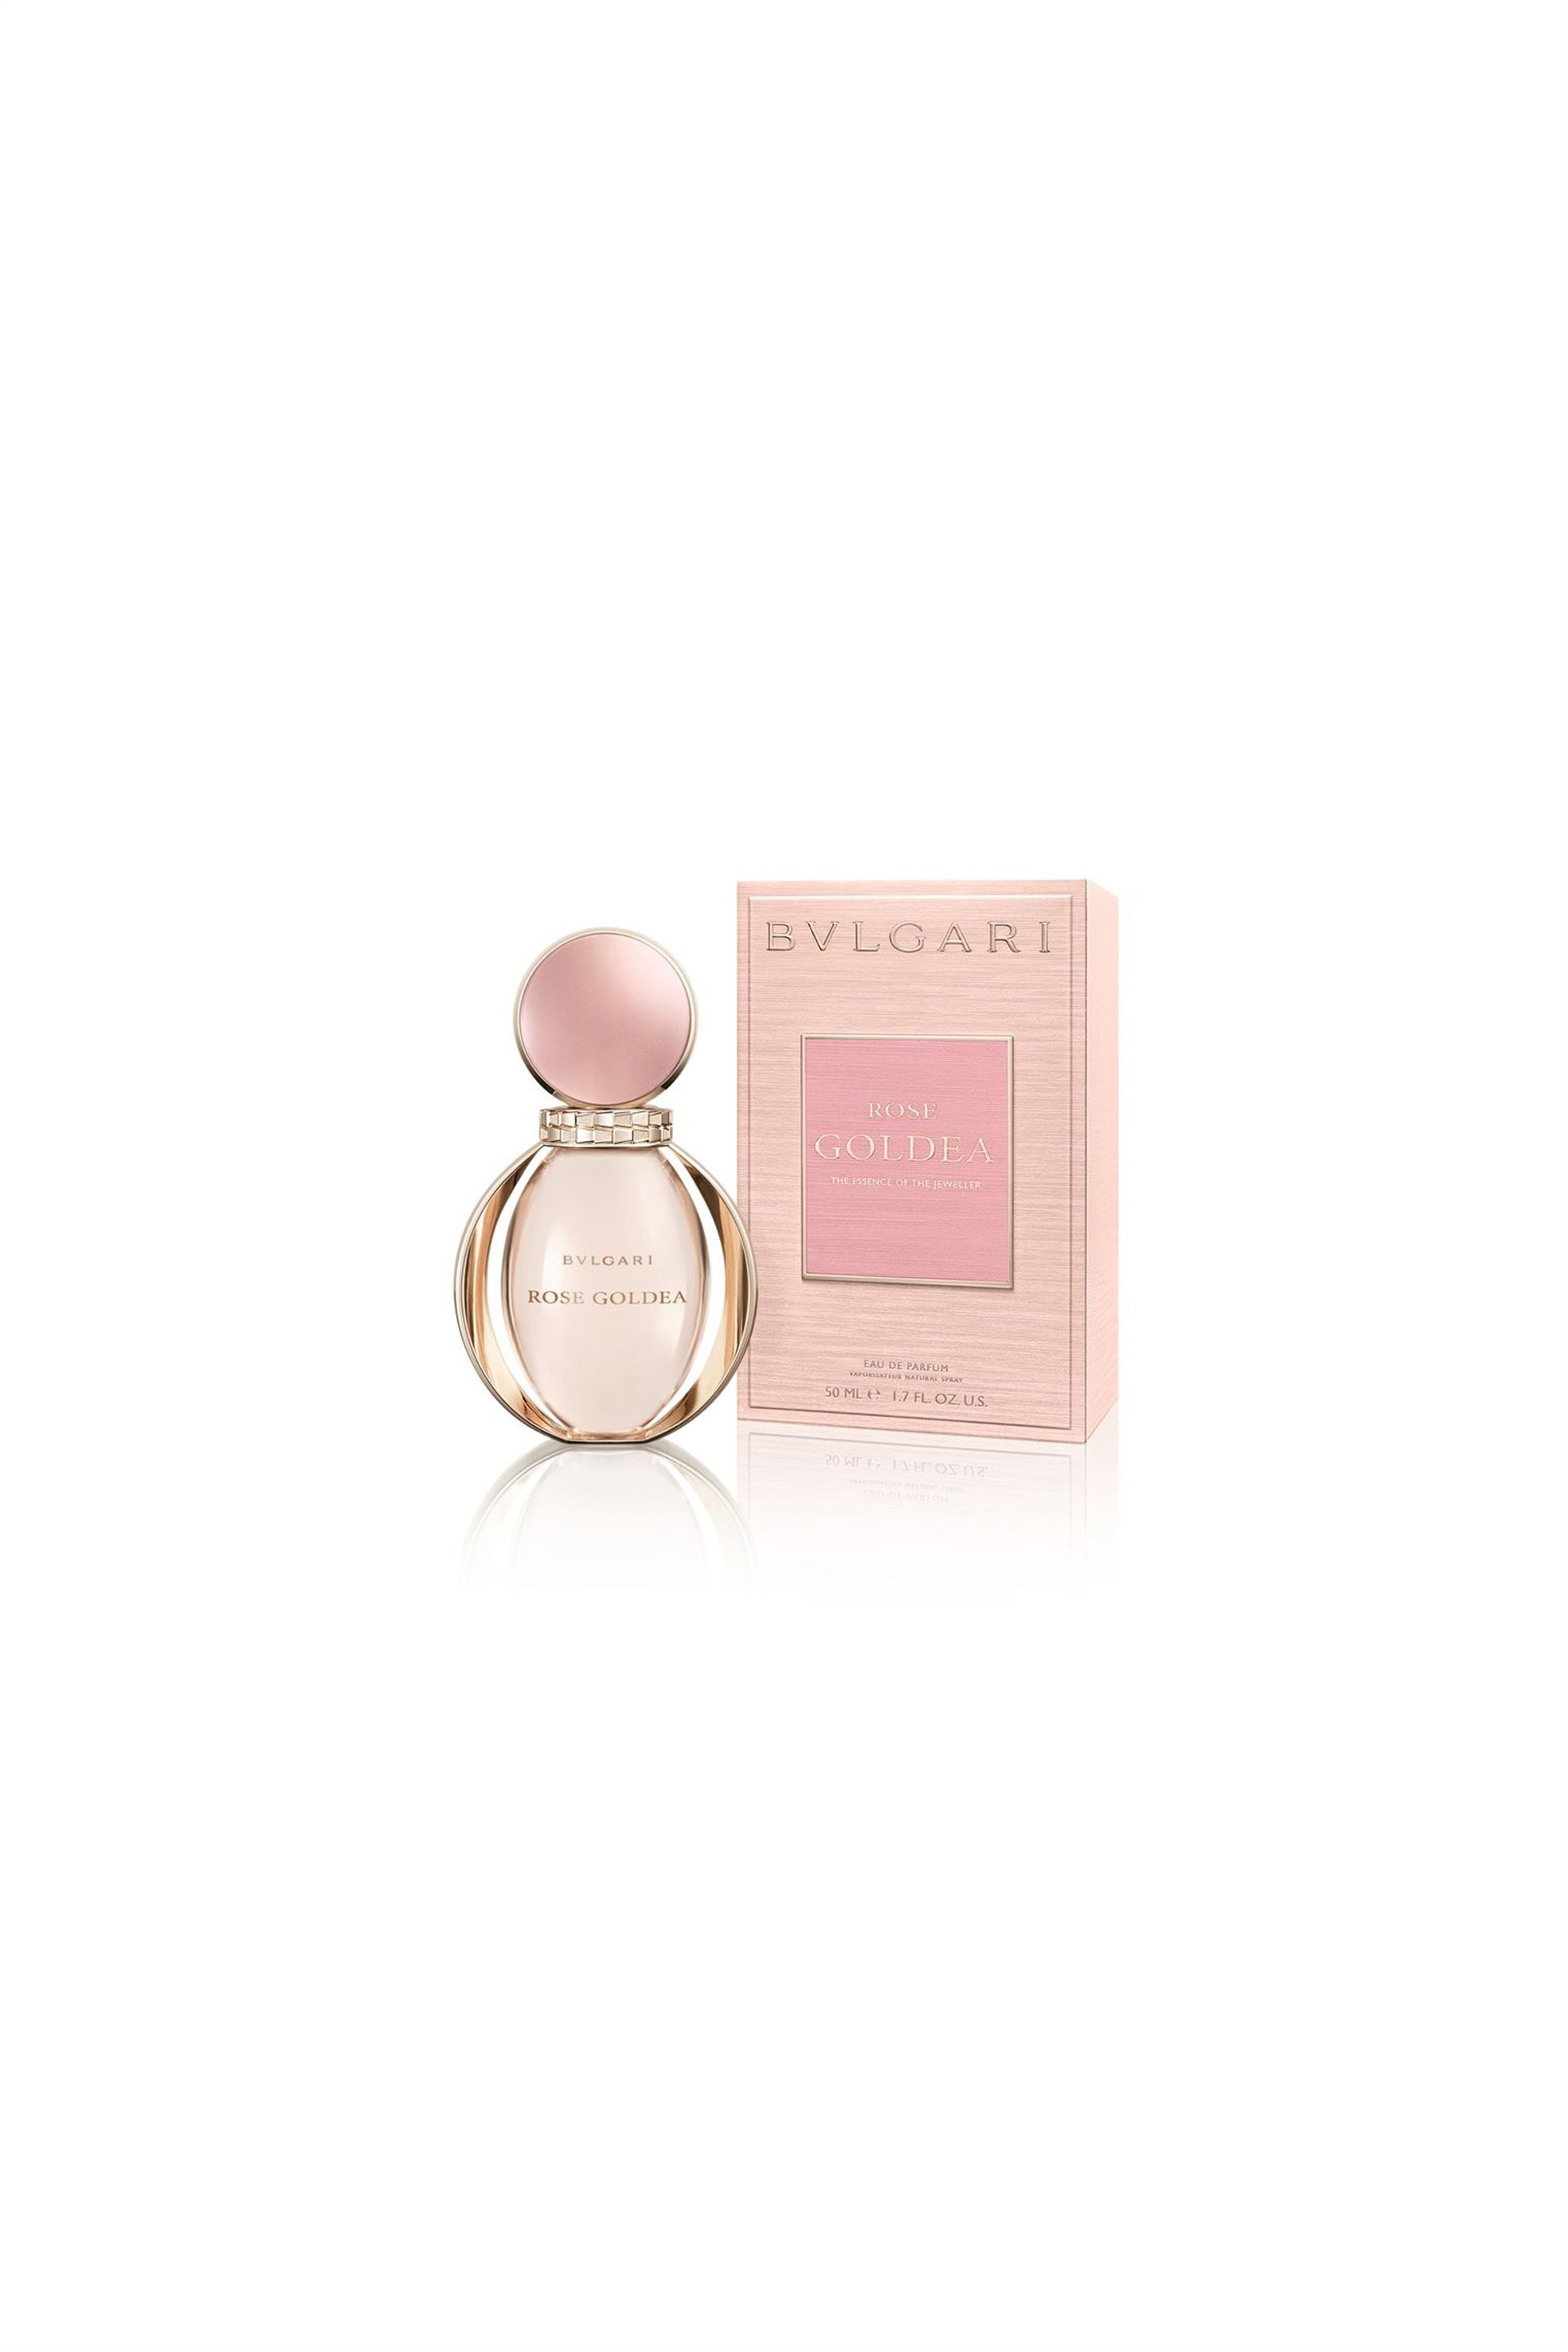 Bvlgari - Κορυφαία προϊόντα για ολοκληρωμένα Outfit - Σελίδα 4 ... 99be6cd9c3b